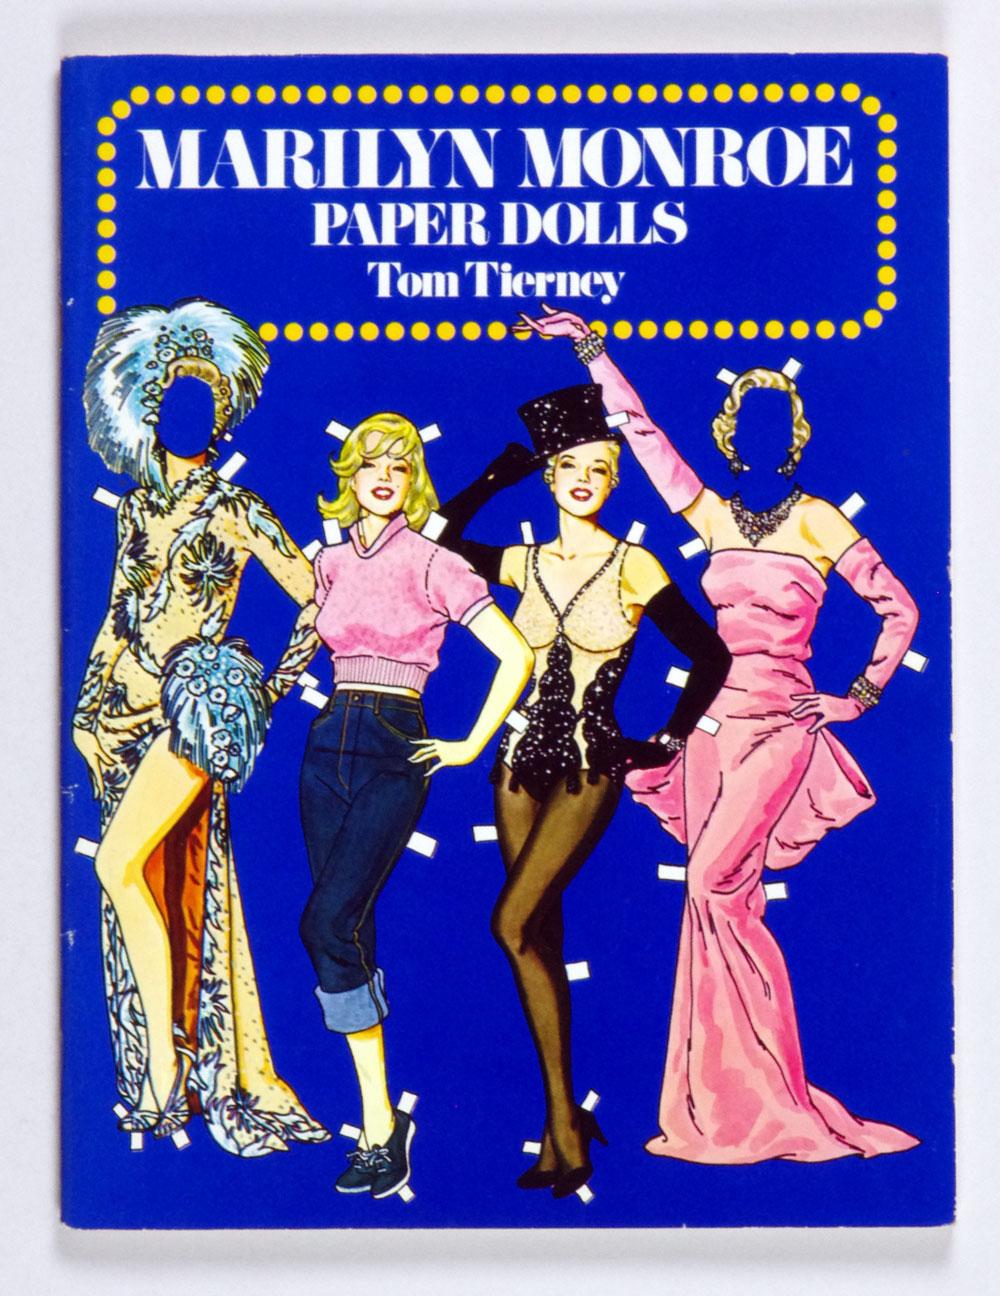 Marilyn Monroe Book Paper Dolls in Full Color 1979 Tom Tierney